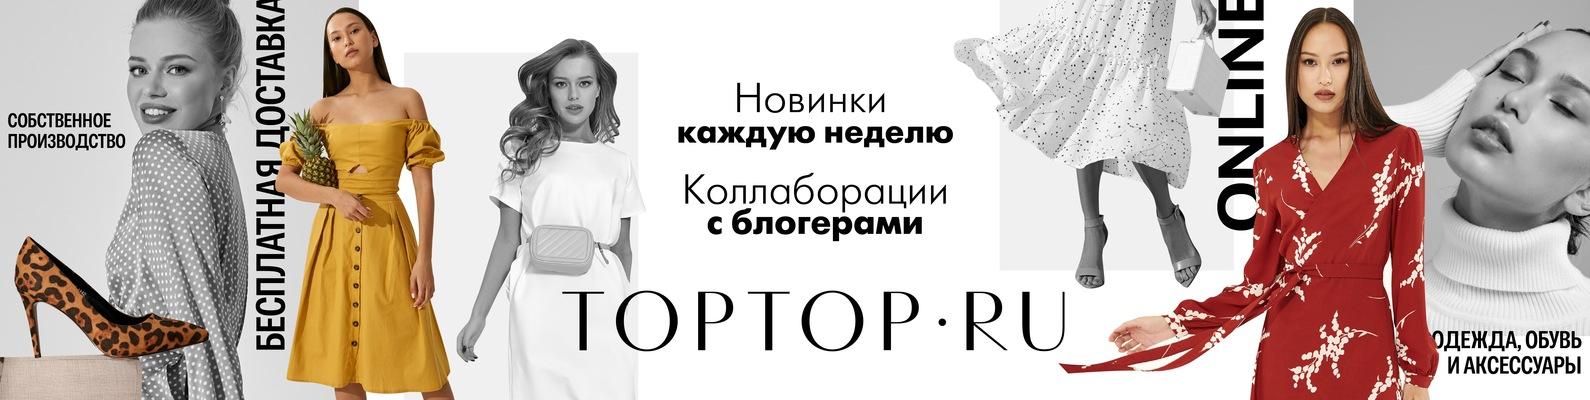 465f842eb25 TOPTOP.RU онлайн-магазин женской одежды